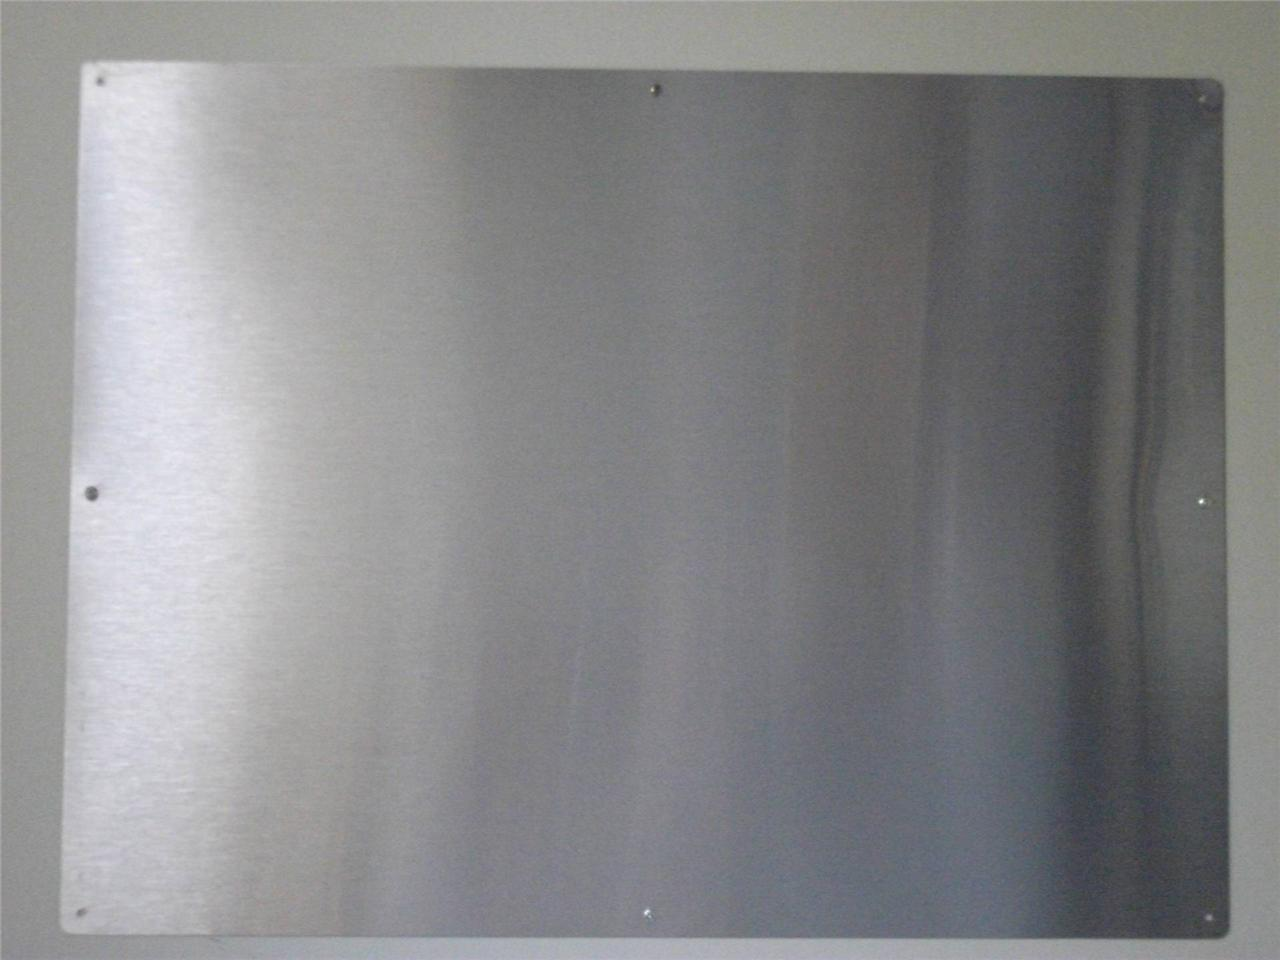 culinarian ii™  magnetic spice rack   square tins versaboard  - culinarianiimagneticspiceracksquaretins